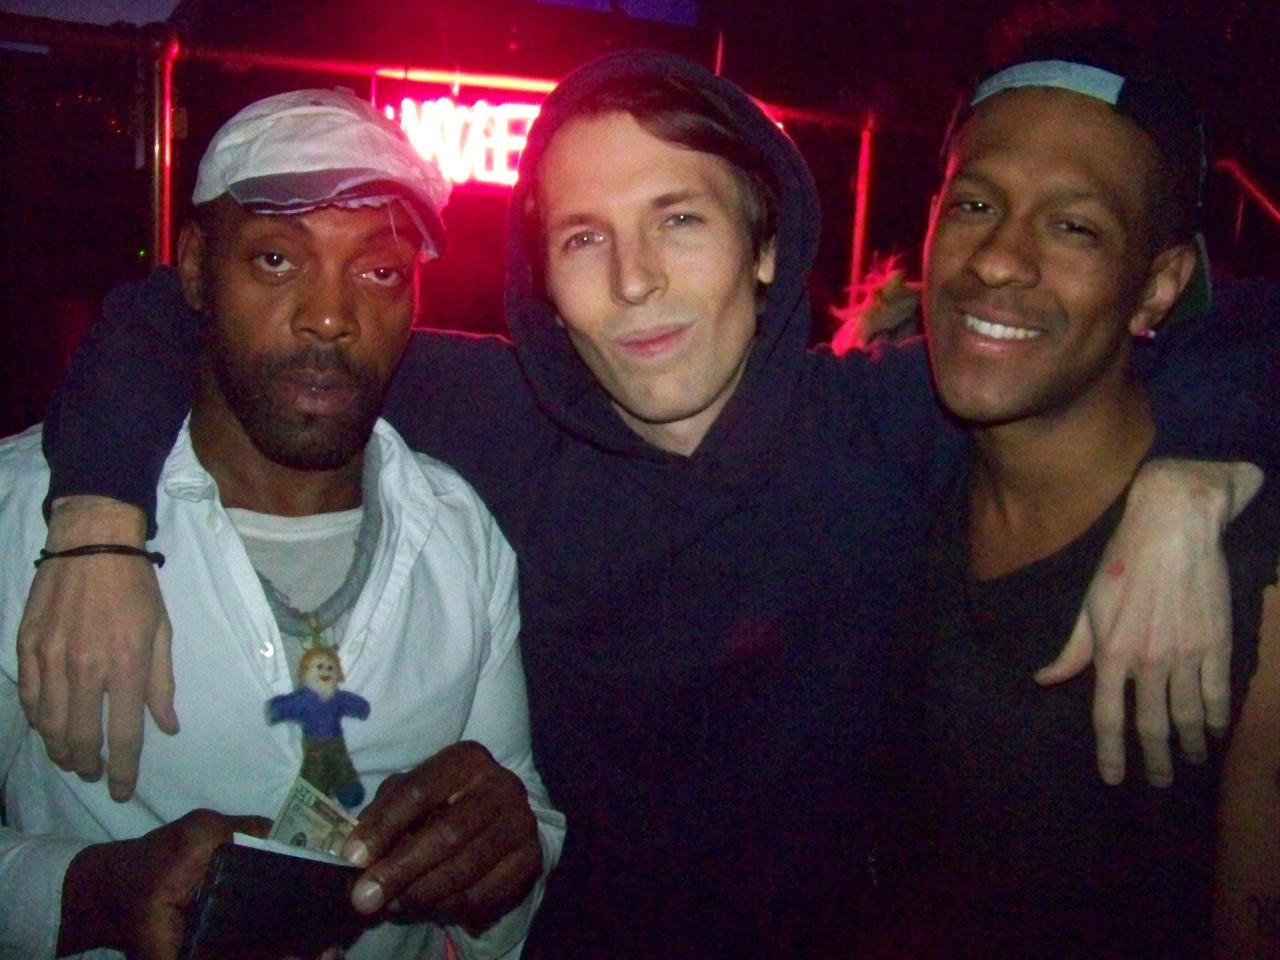 Andre Walker, Ryan McGinley and Mykki Blanco, photo© Quentin Belt